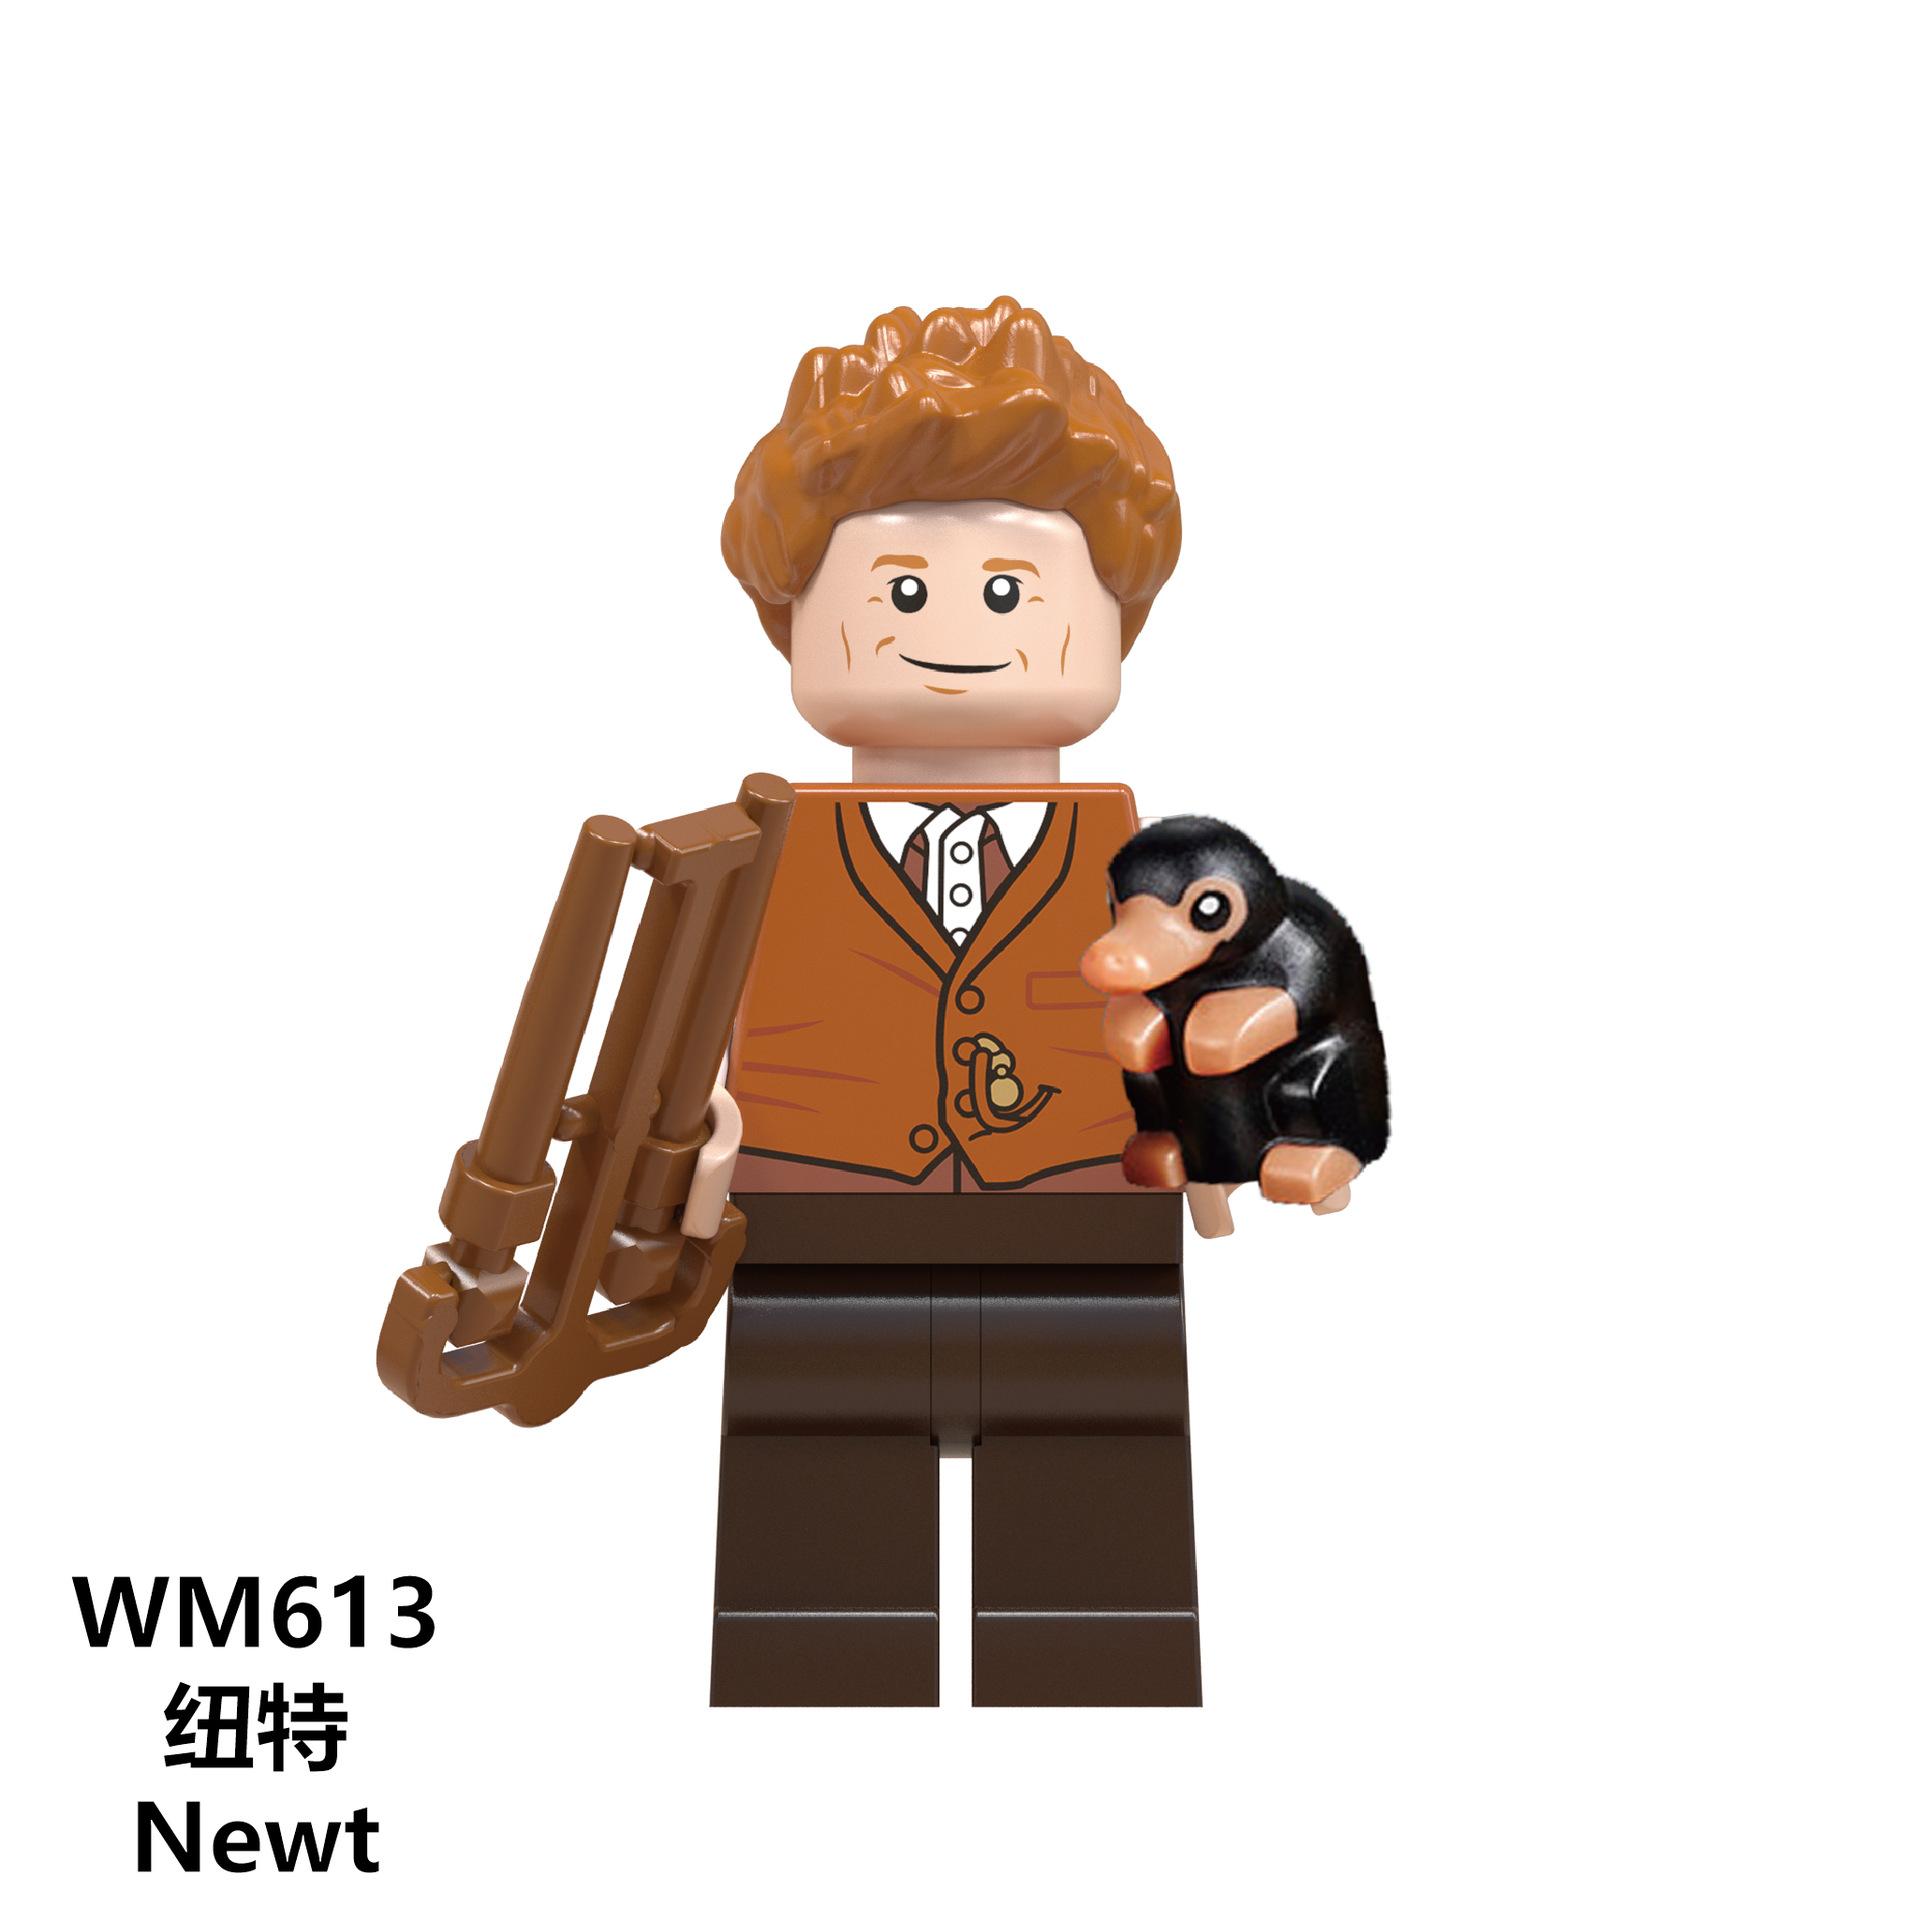 WM613